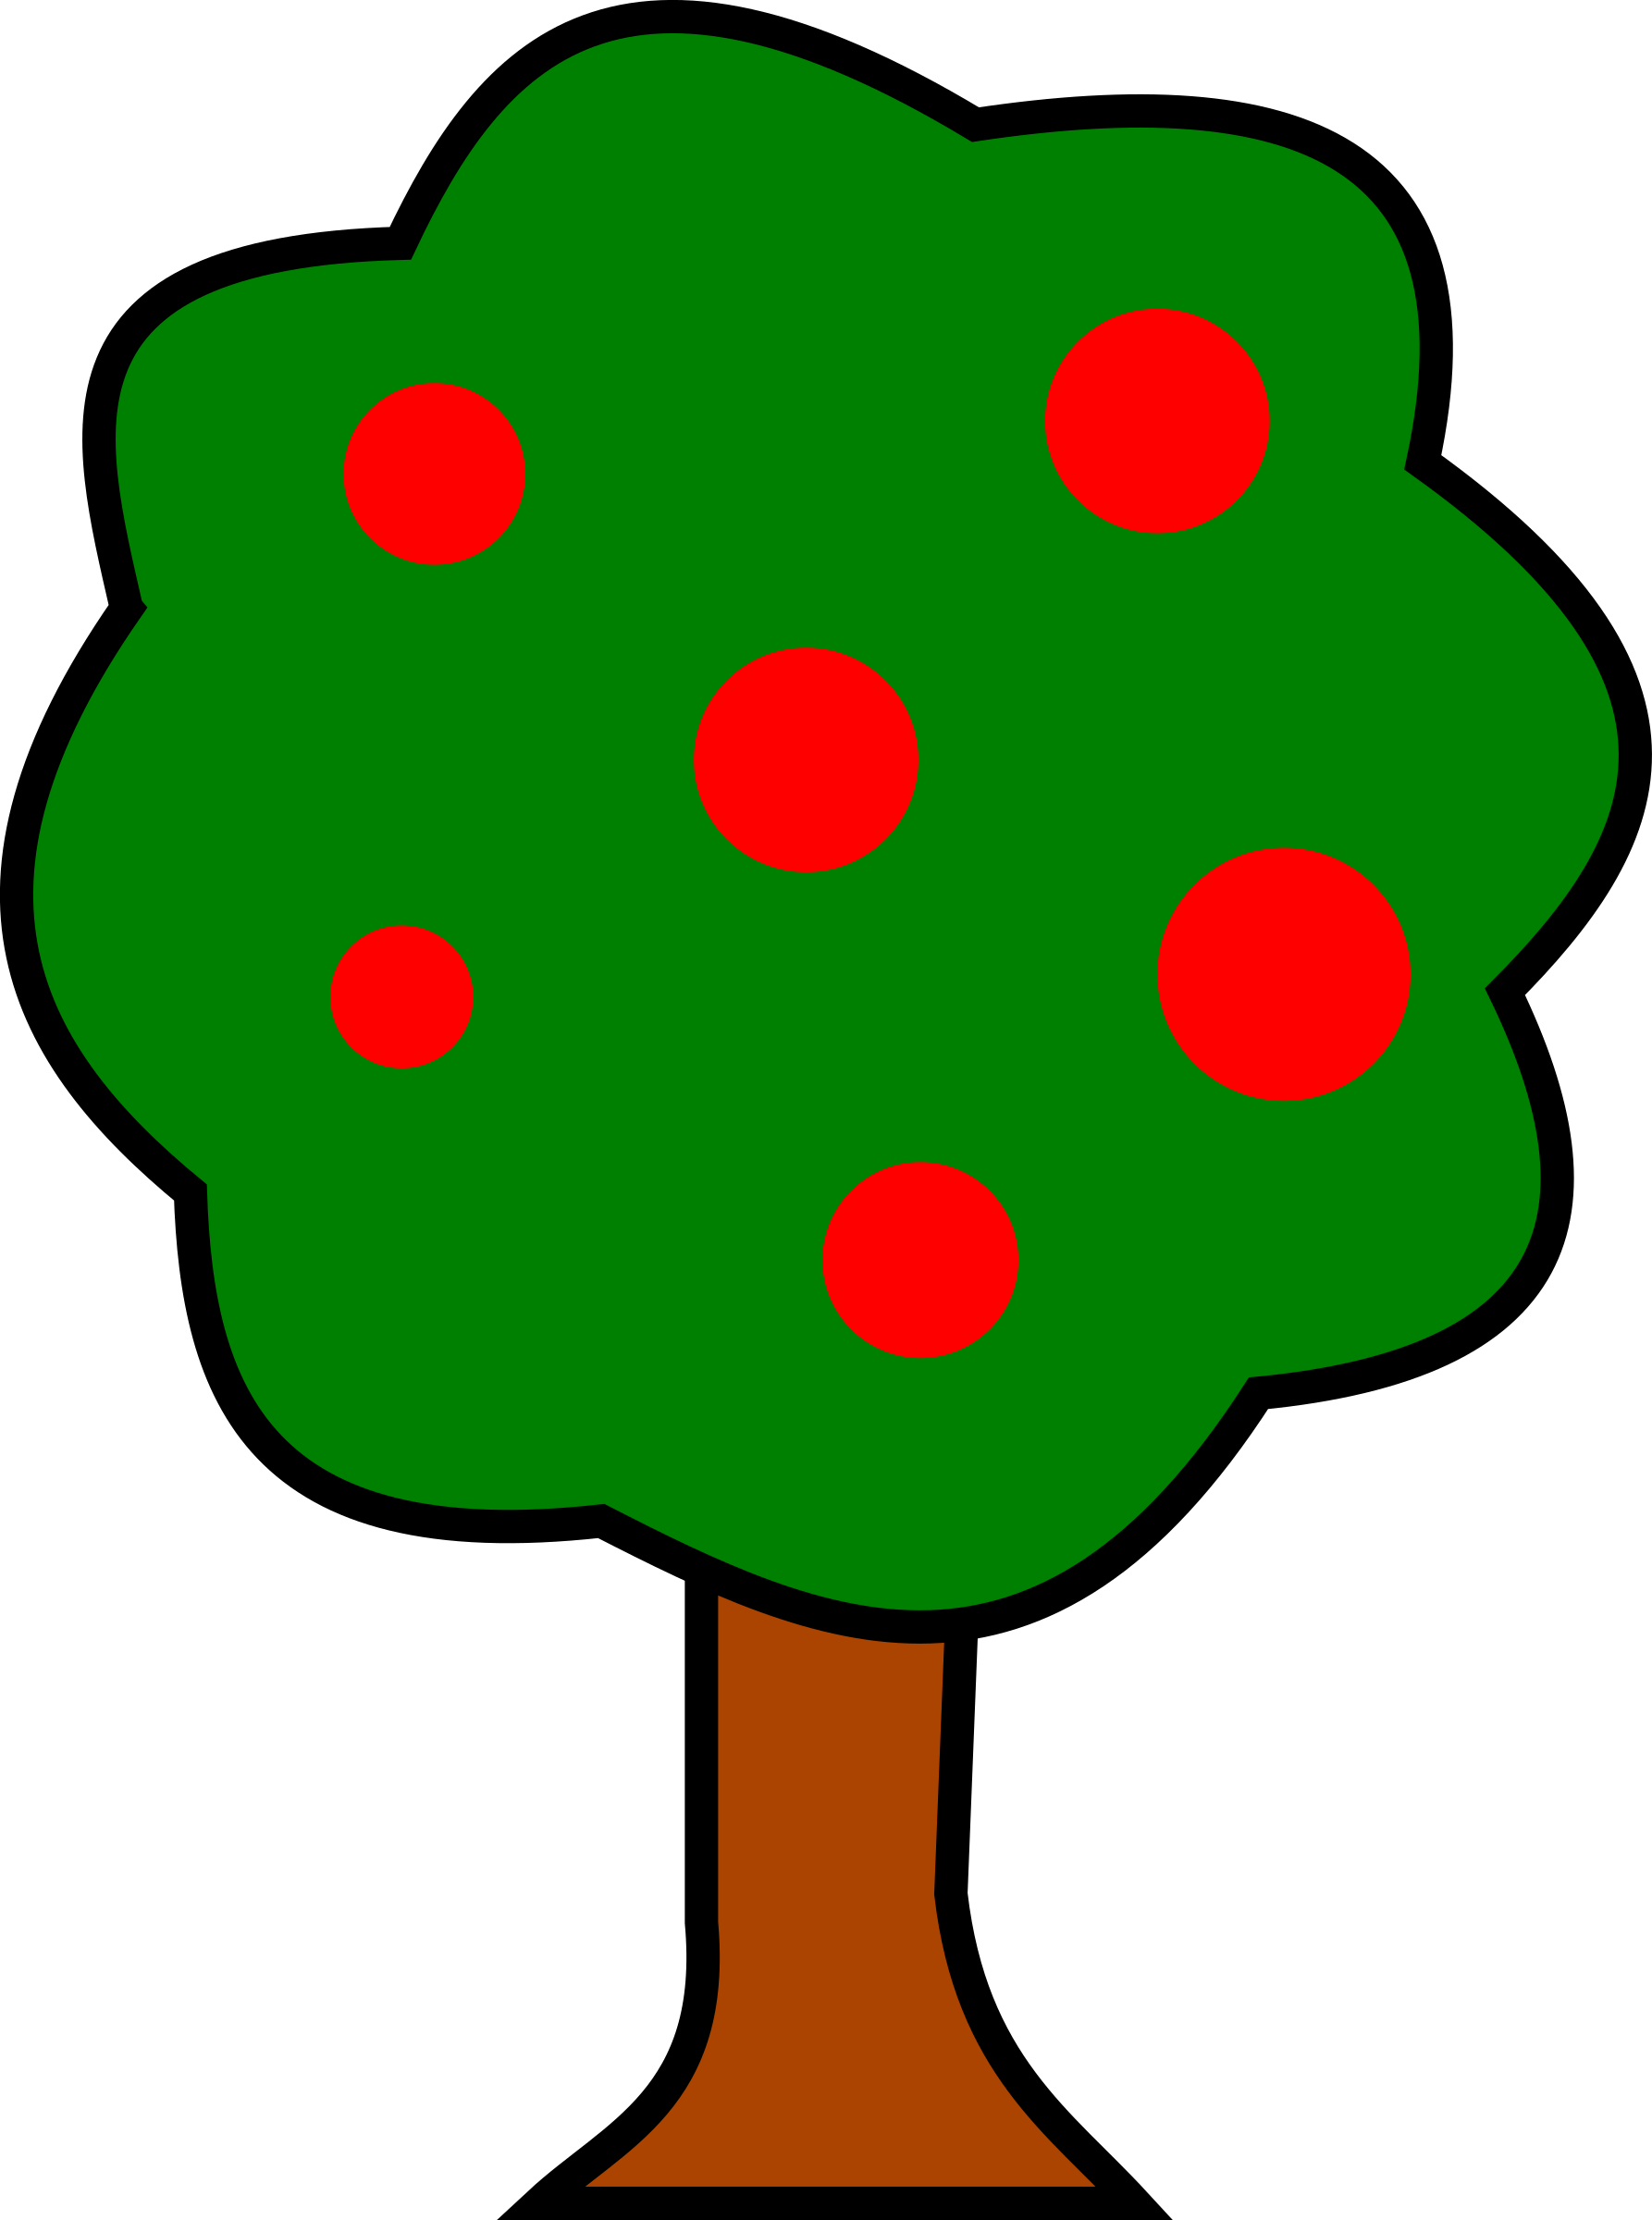 Tree clipart santol. Fruit big image png